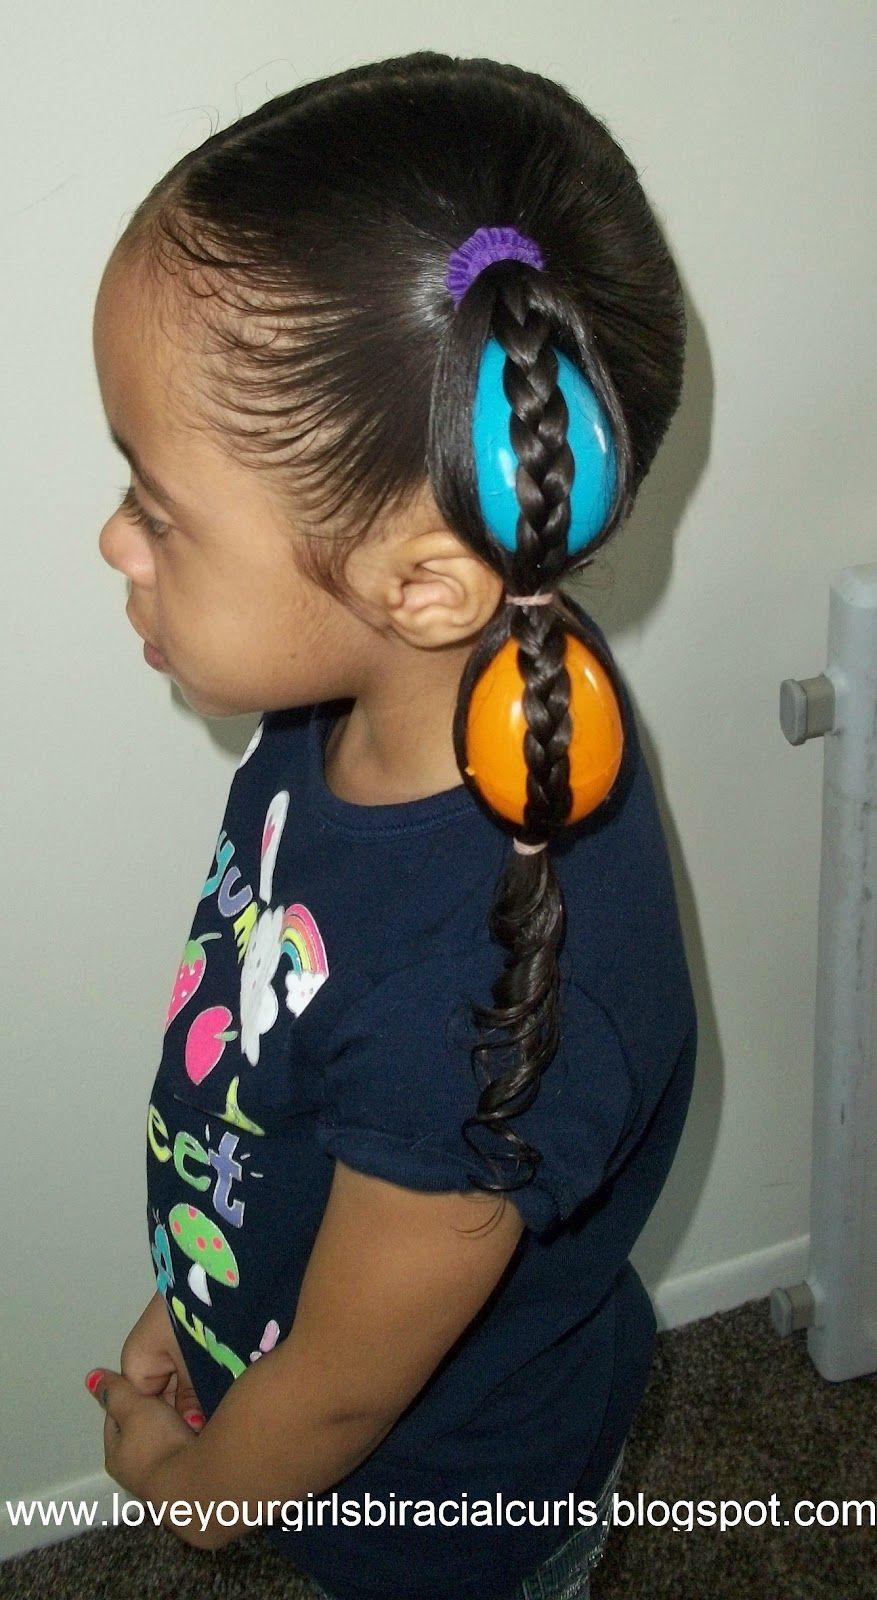 Astounding Mixed Girl Hairstyles Mixed Girls And Girl Hairstyles On Pinterest Hairstyle Inspiration Daily Dogsangcom